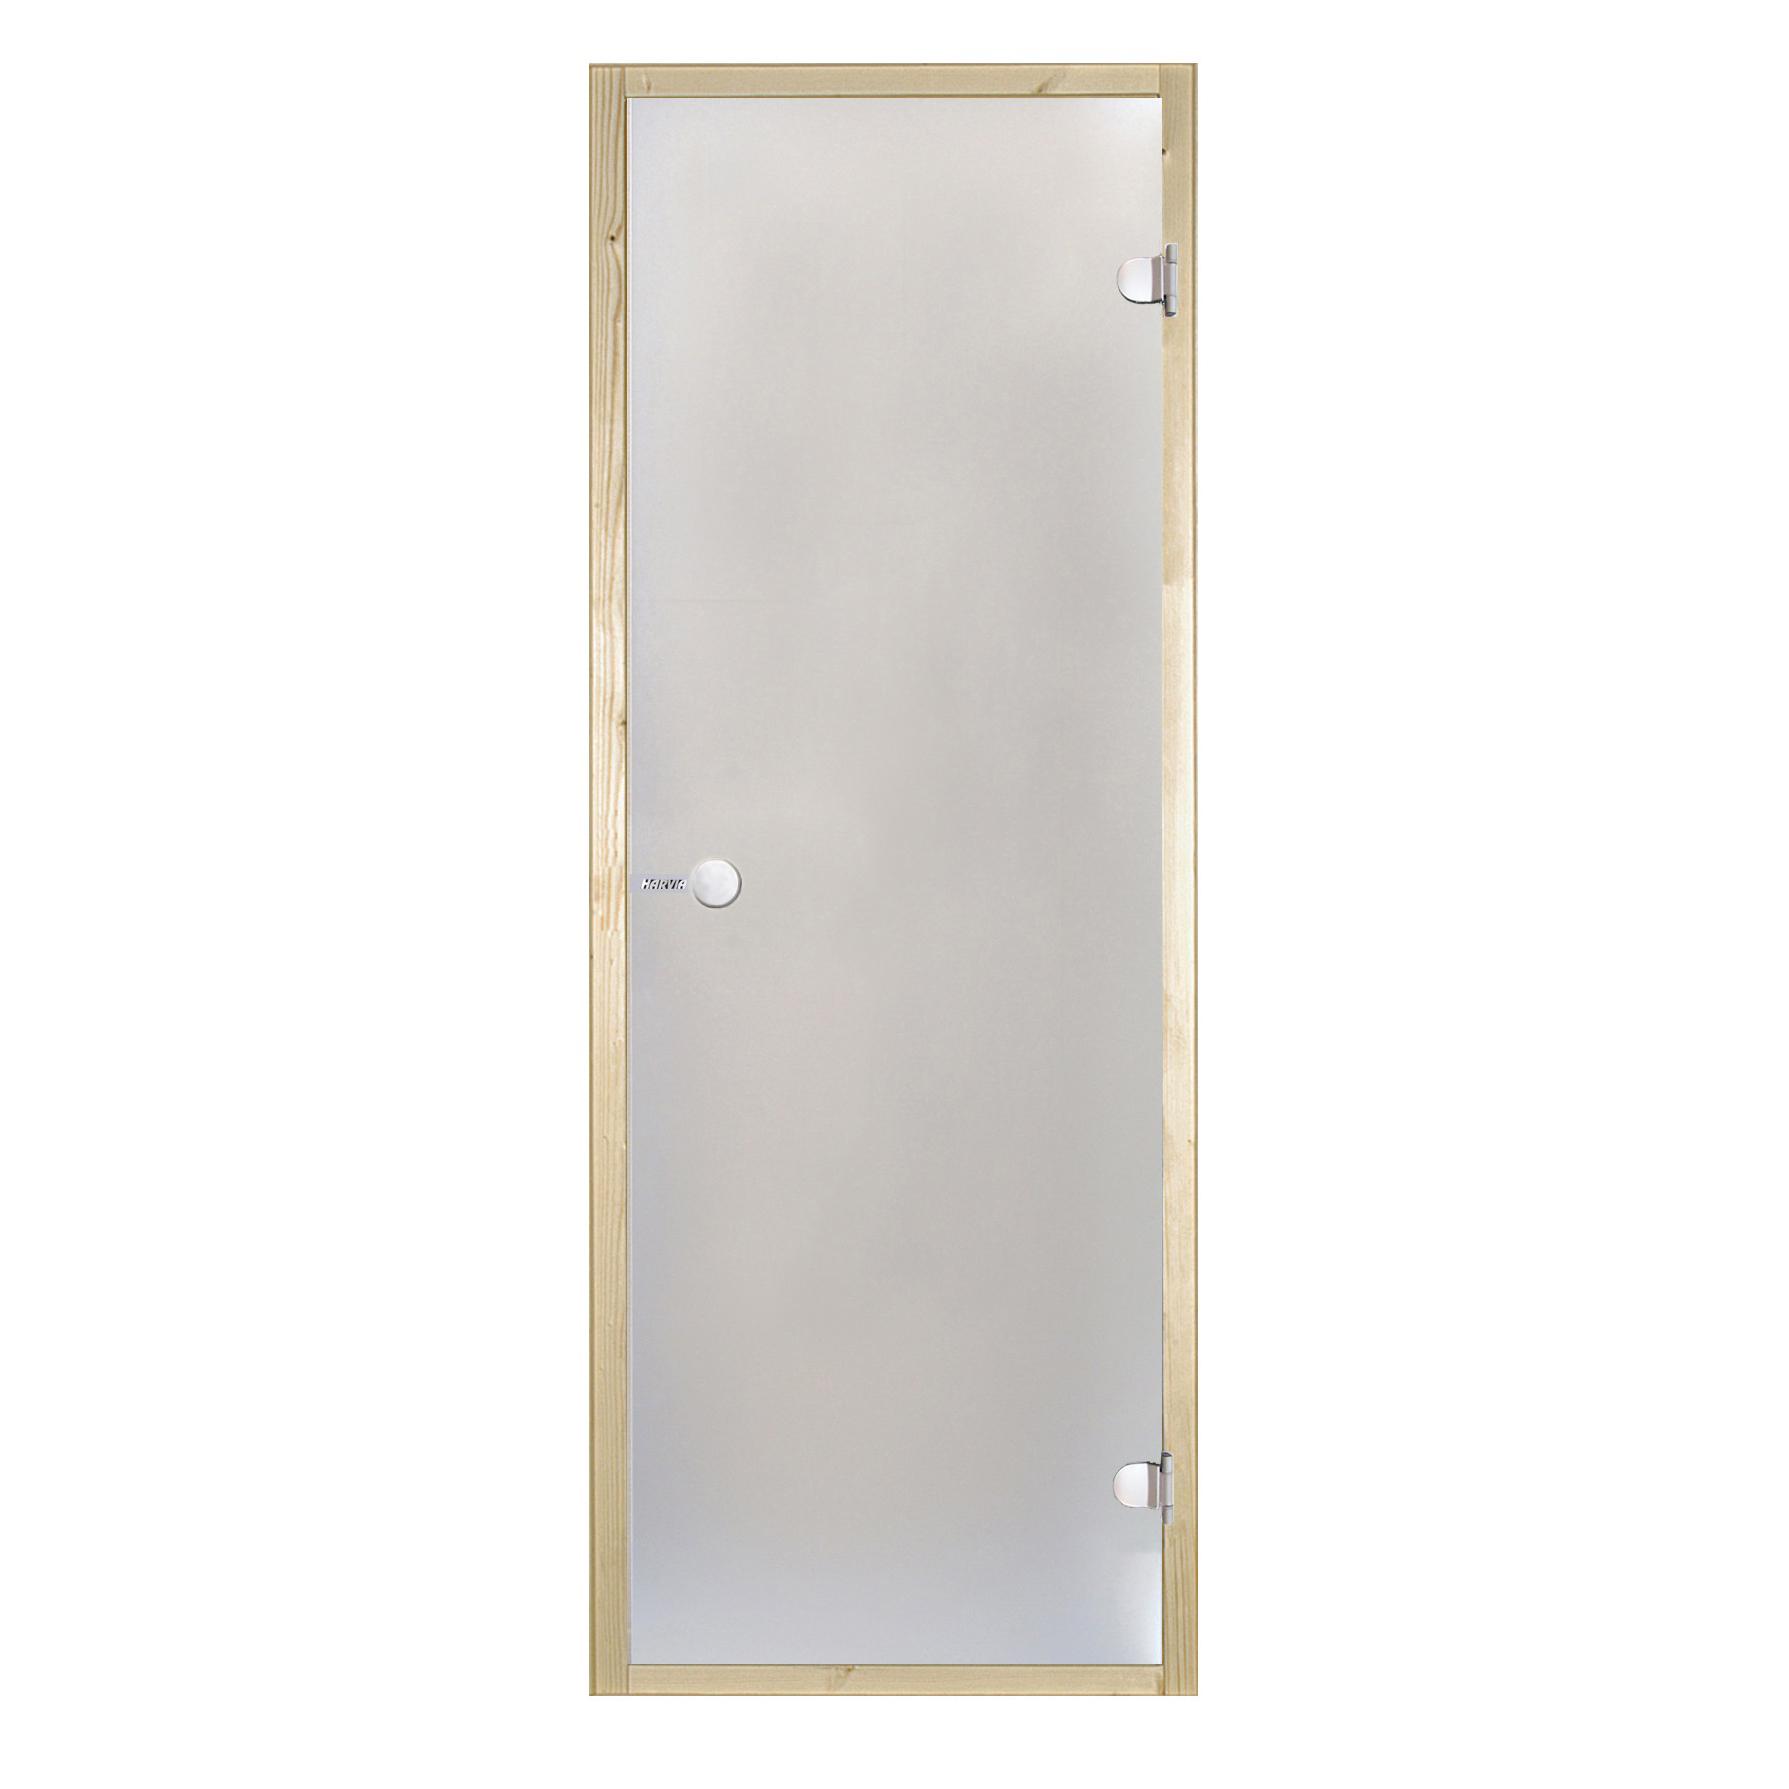 HARVIA Двери стеклянные 7/19 коробка осина, сатин D71905H